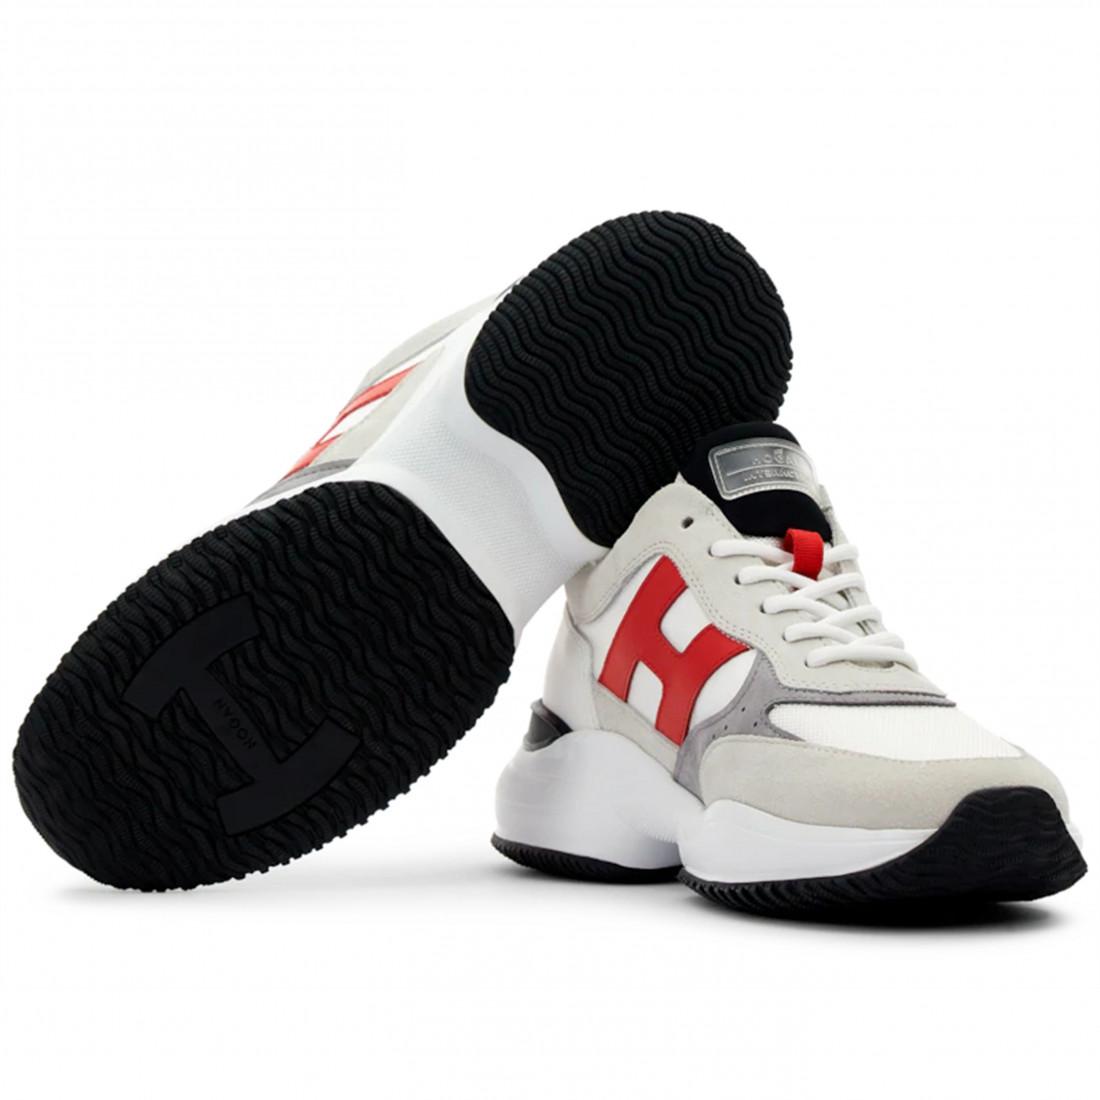 sneakers uomo hogan hxm5450dn90pnx615g 8210